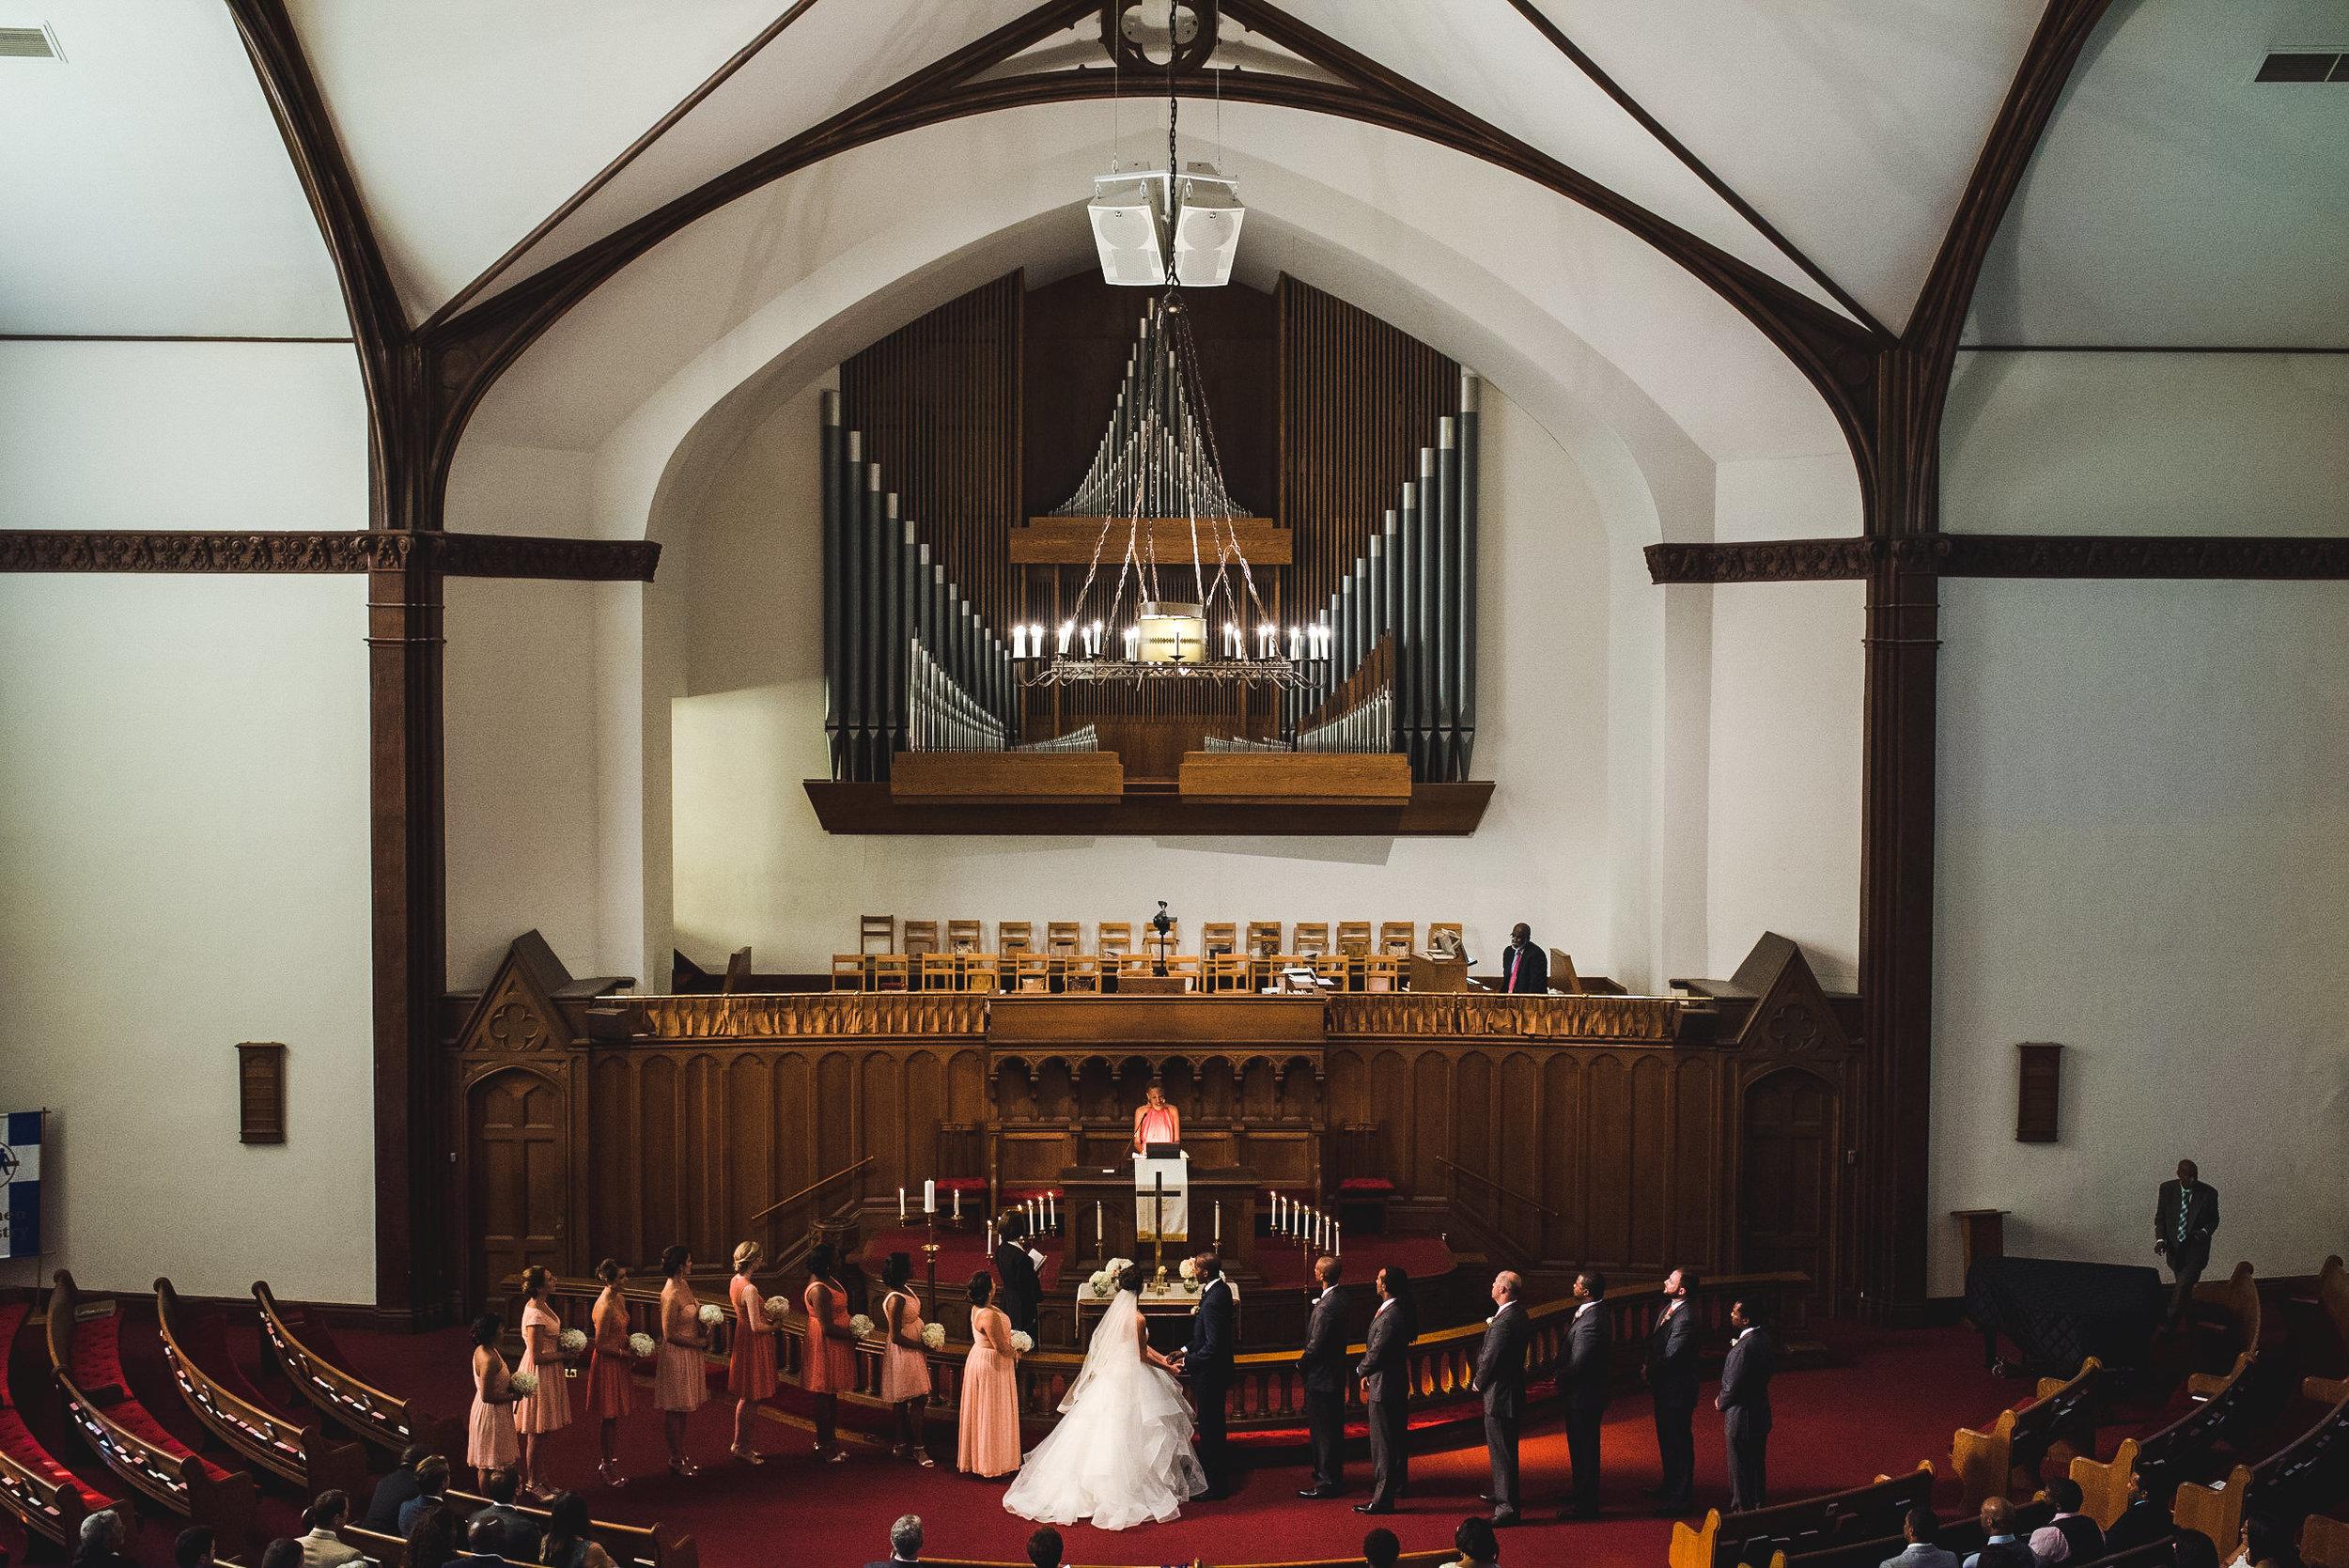 21c Museum Hotel Durham North Carolina Wedding-22.jpg